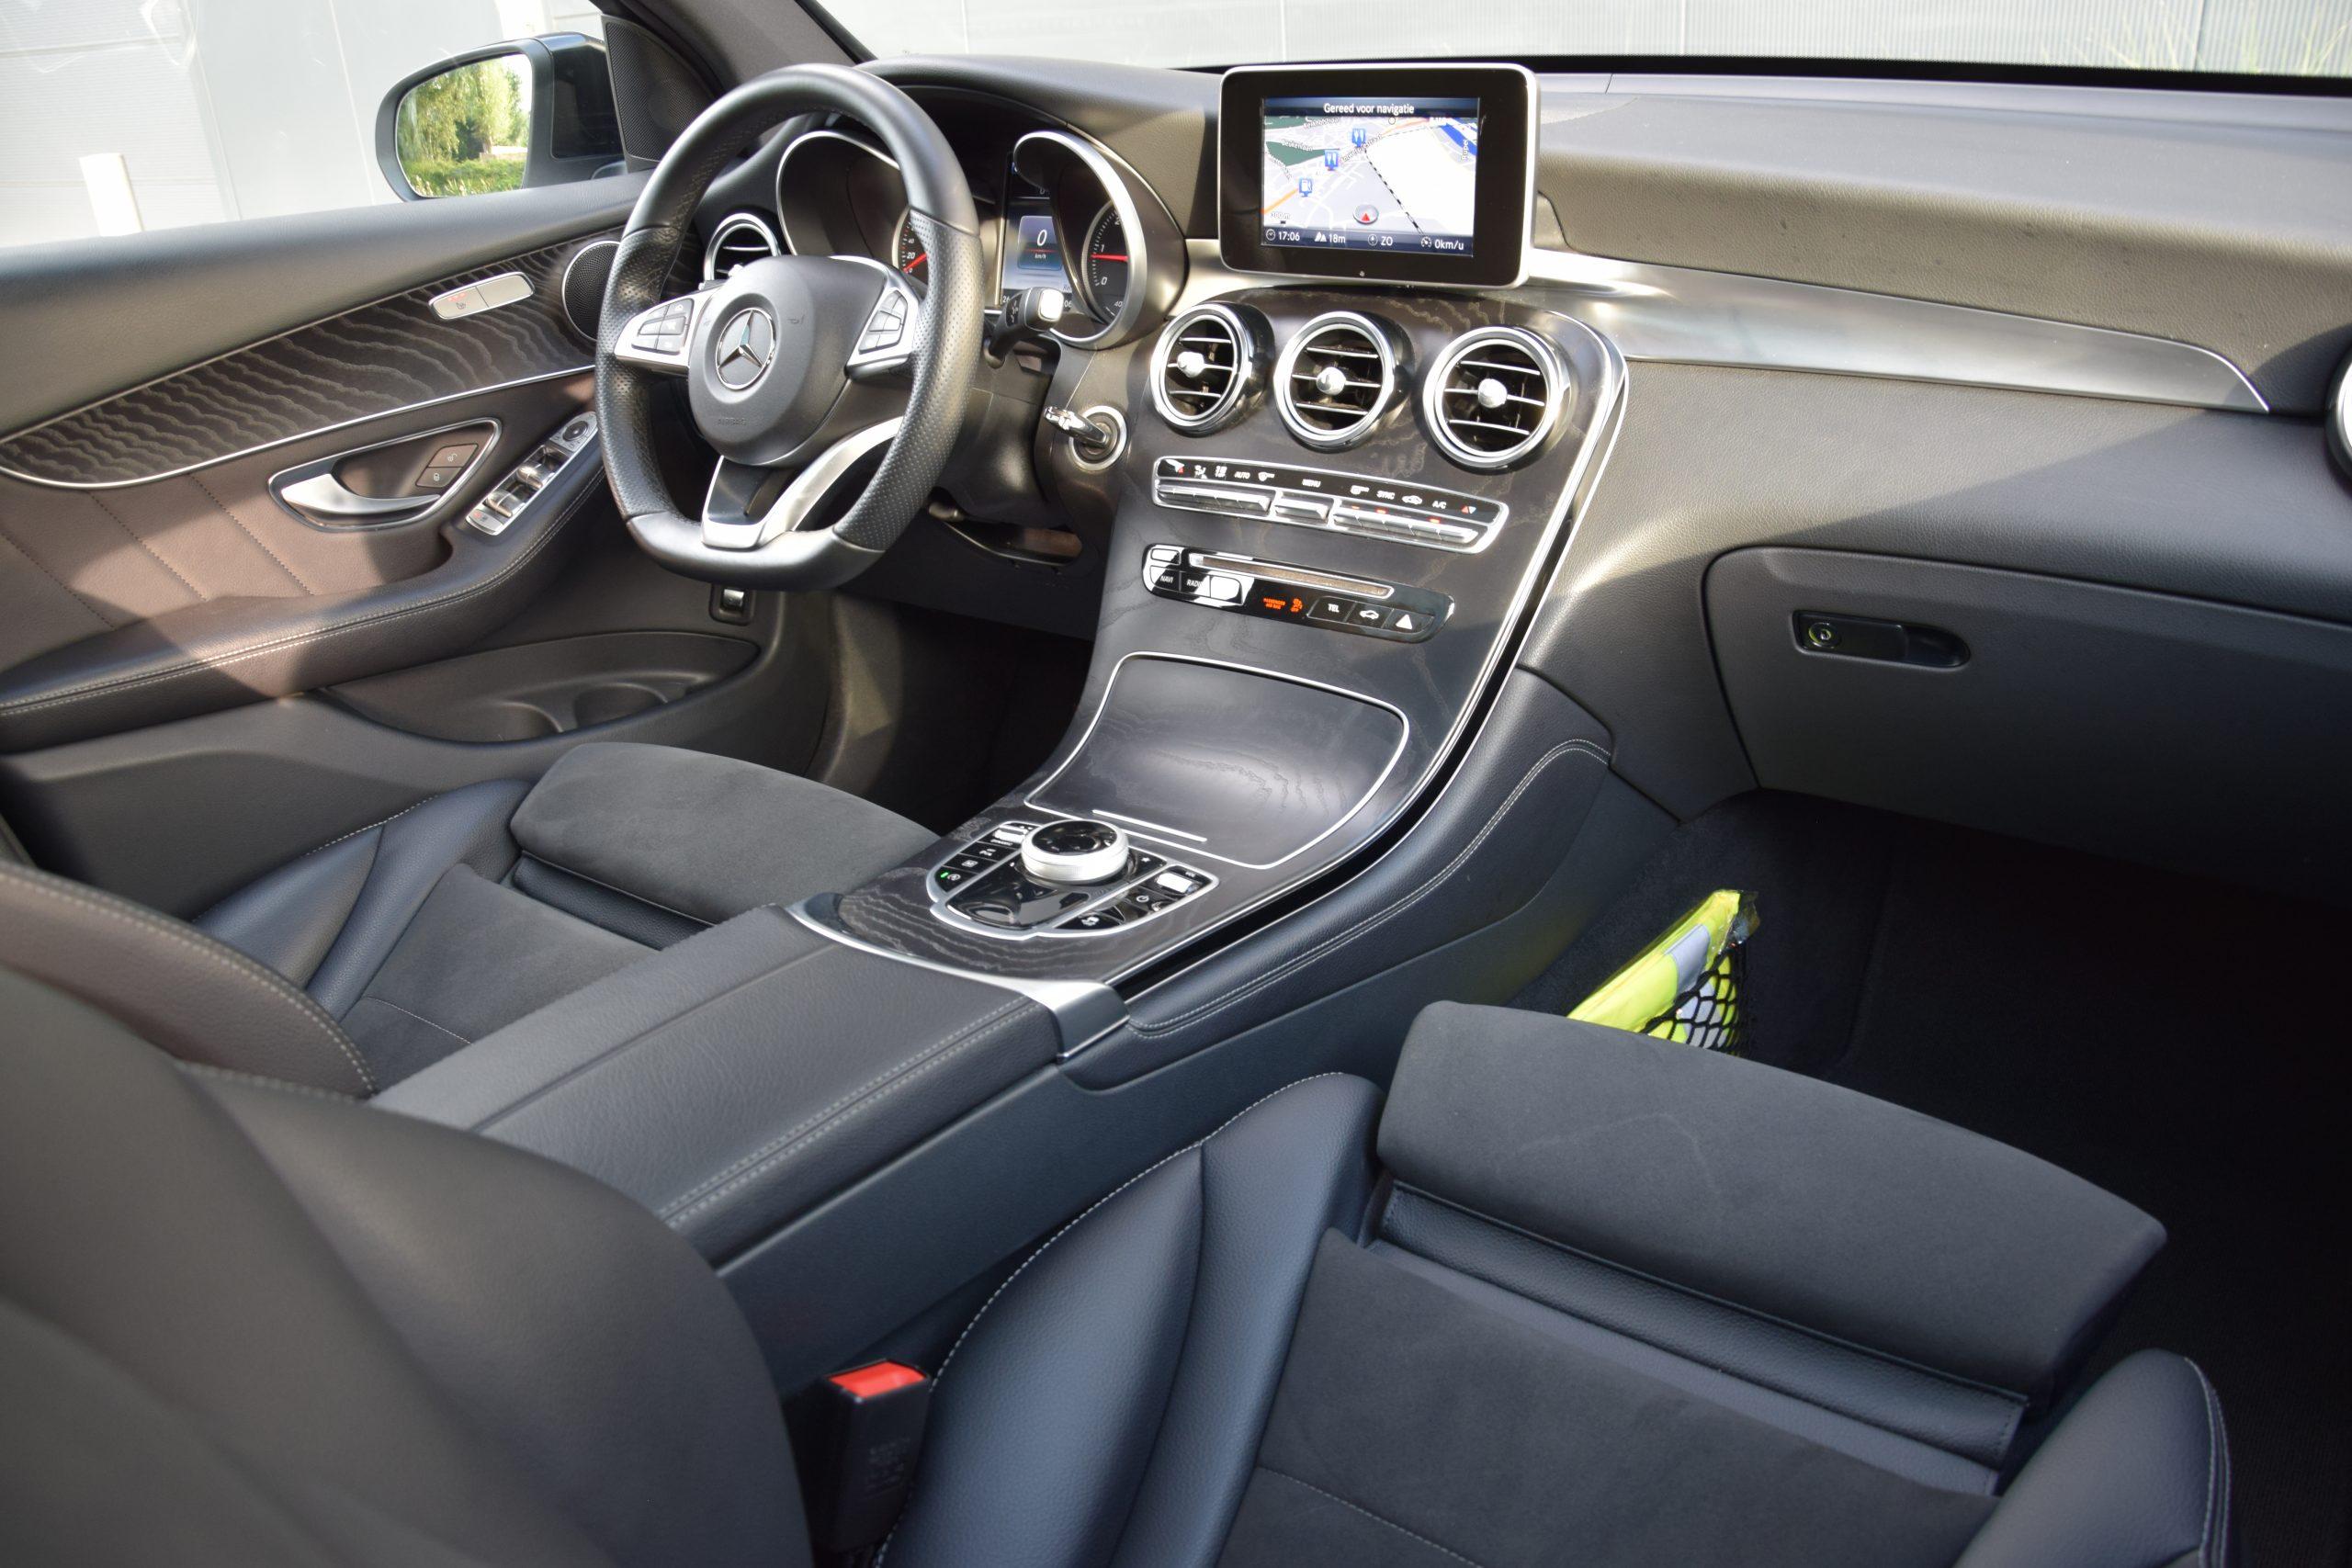 Mercedes-Benz GLC 220d AMG-Sportpakket 10/2016 – Full Option!!